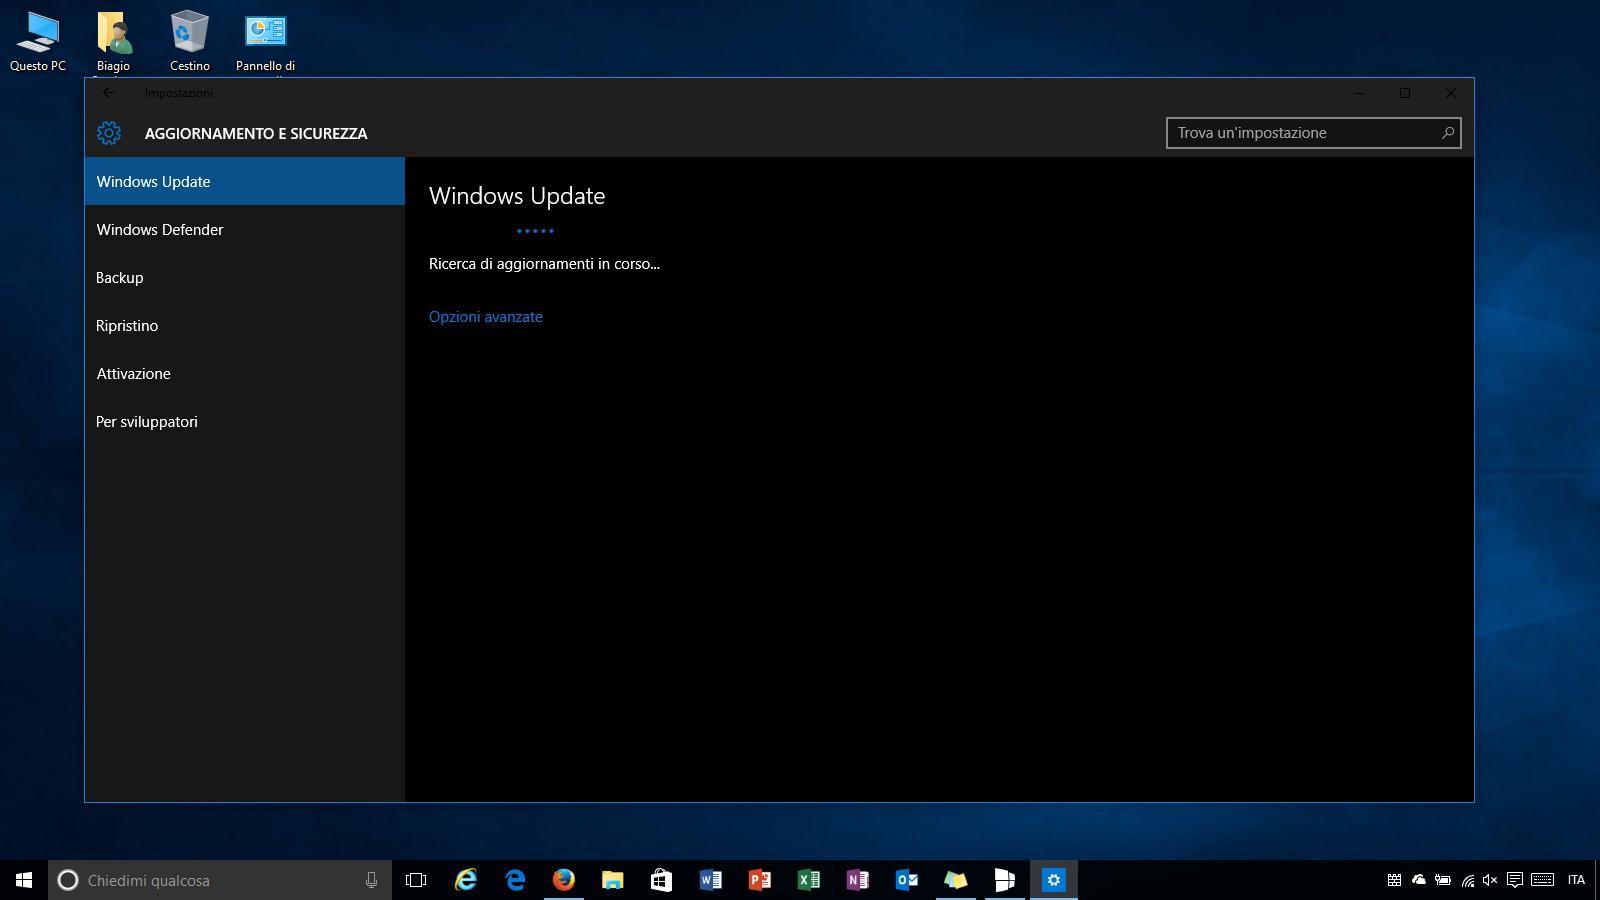 Windows Update - Windows 10